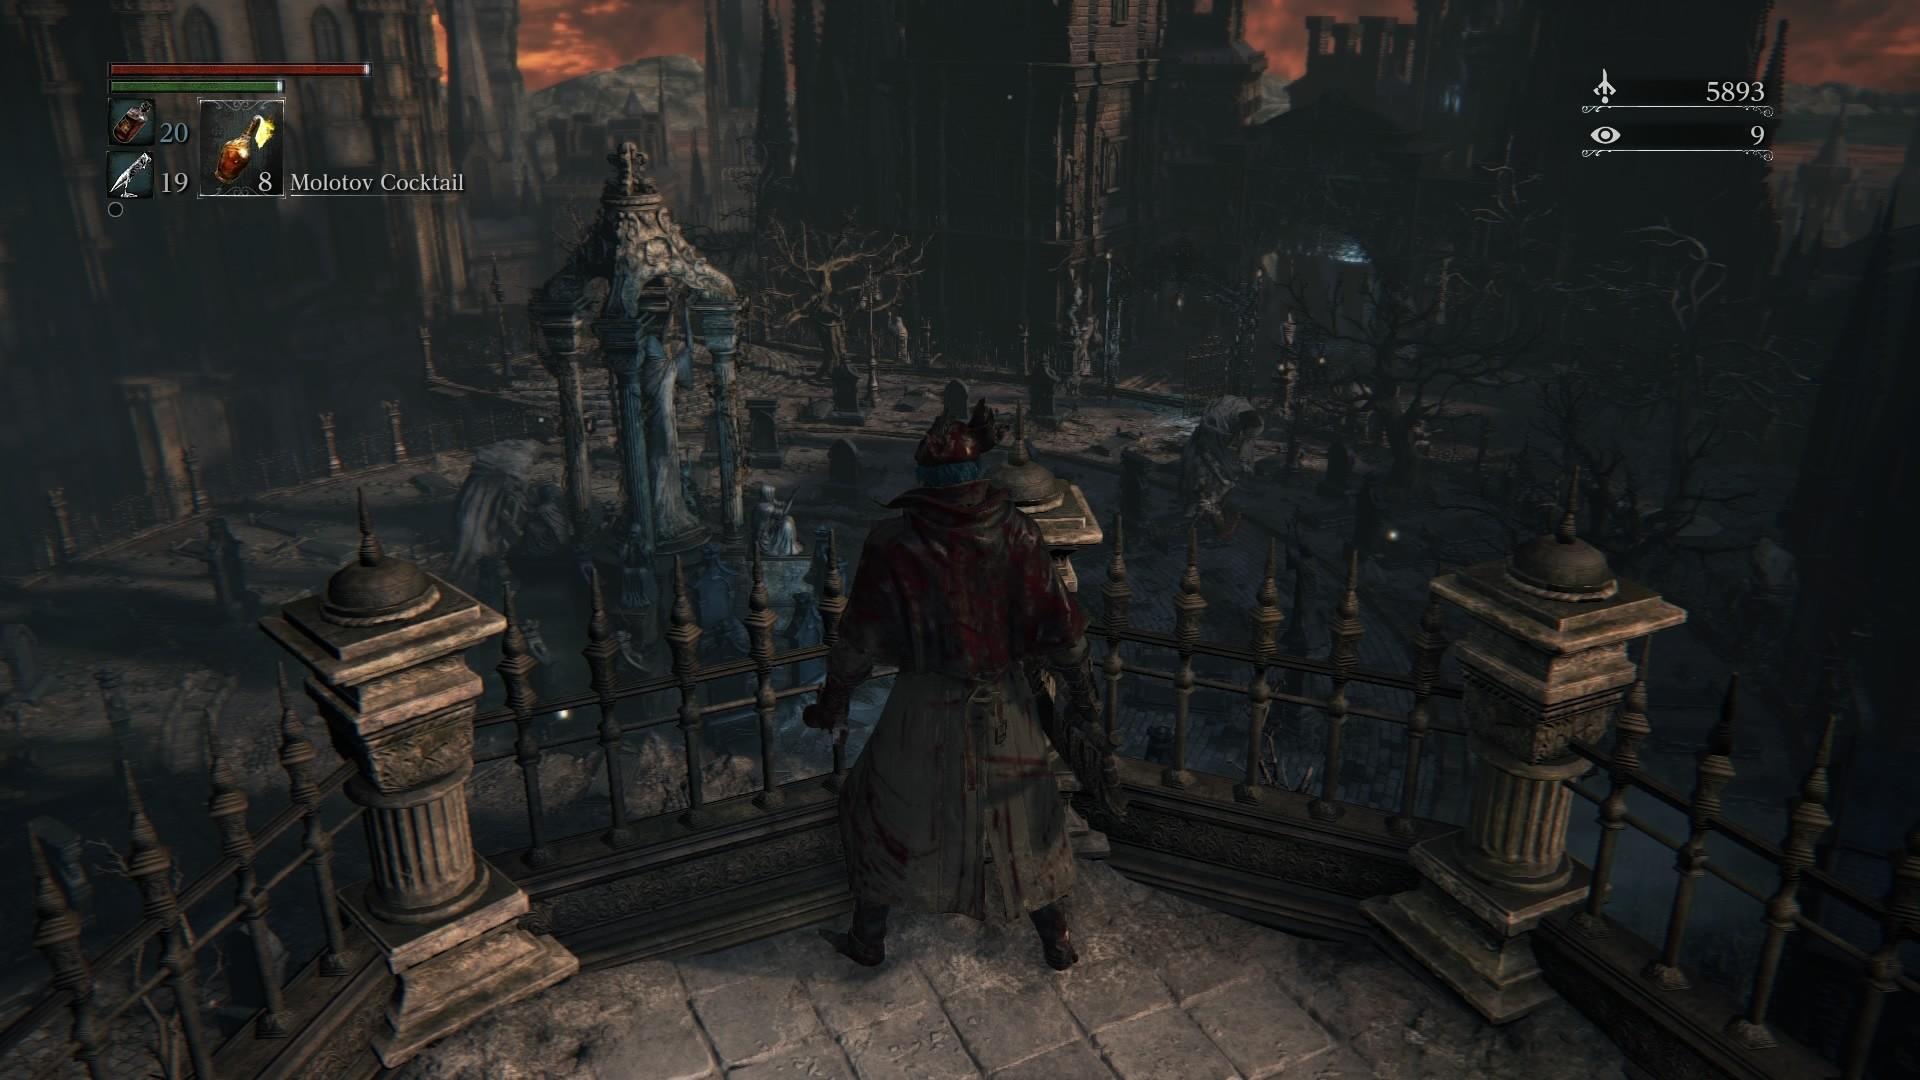 Bloodborne matchmaking range